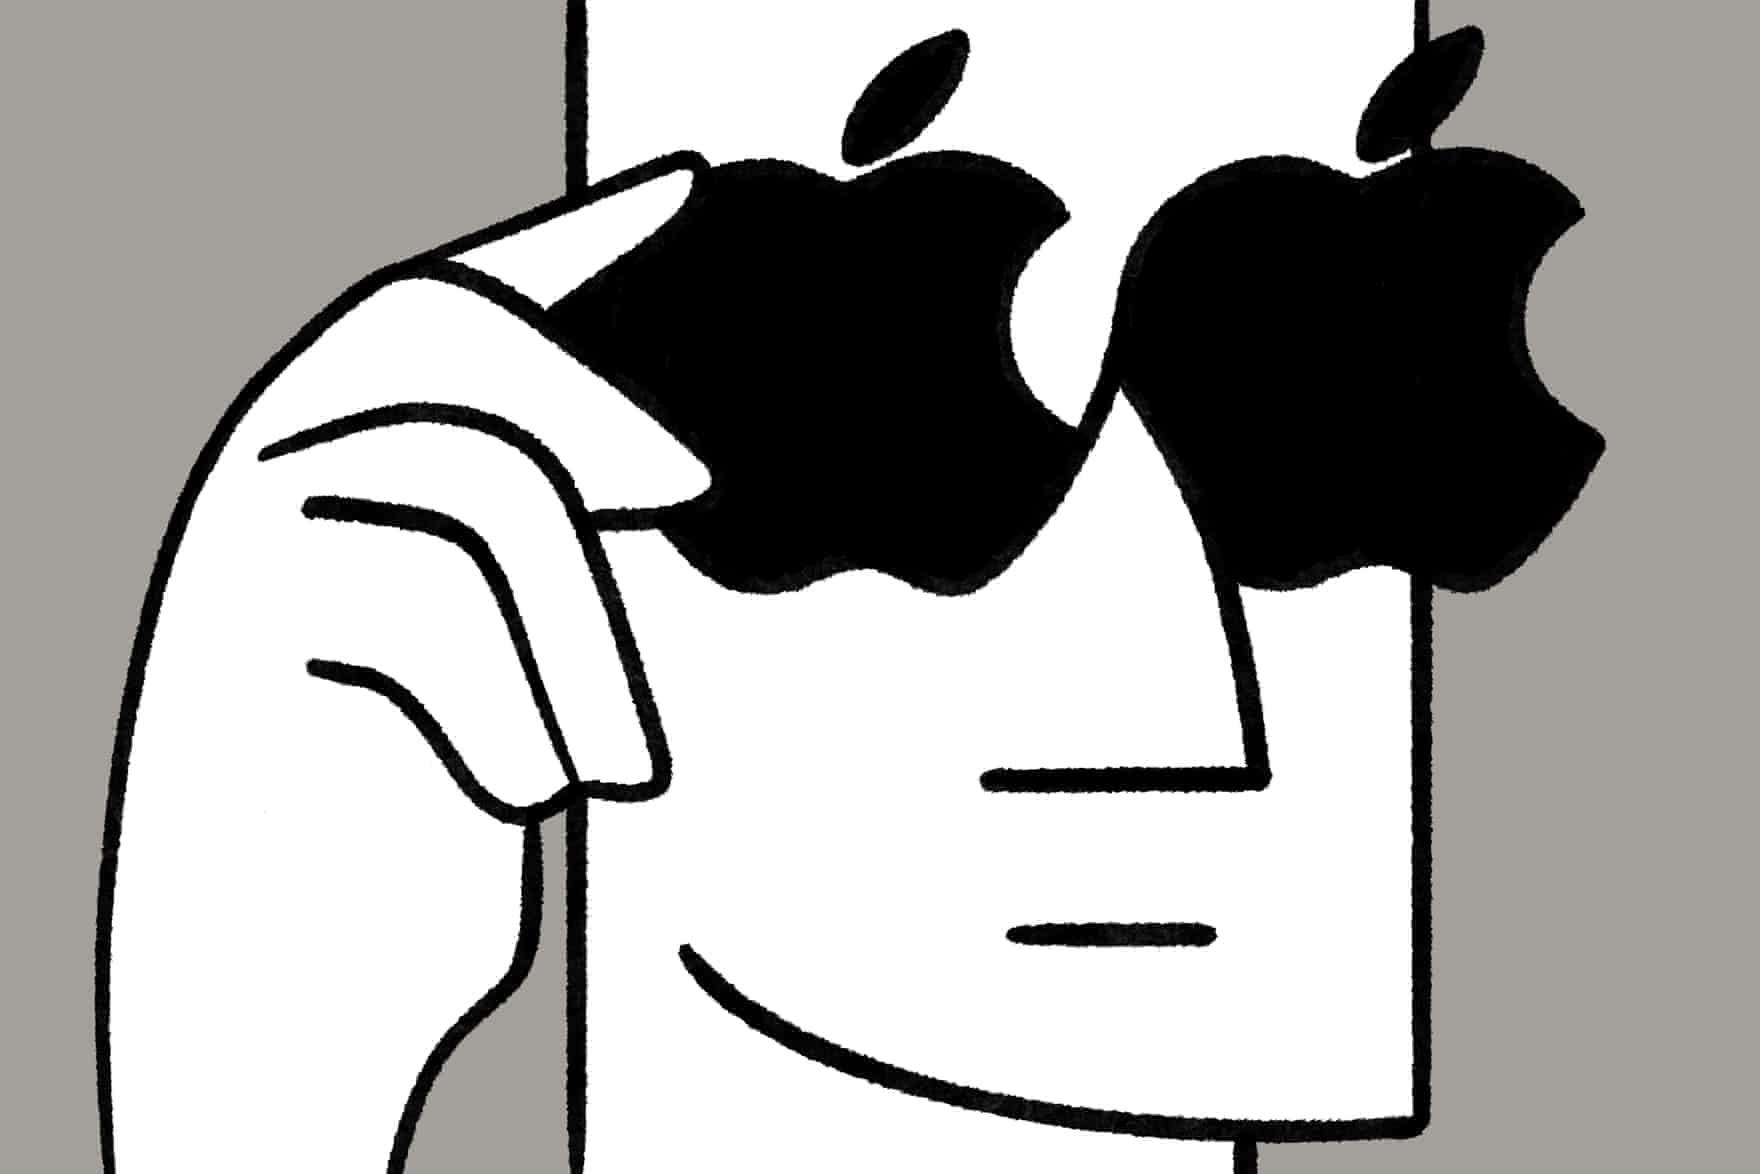 kinh thong minh cua apple anh 4